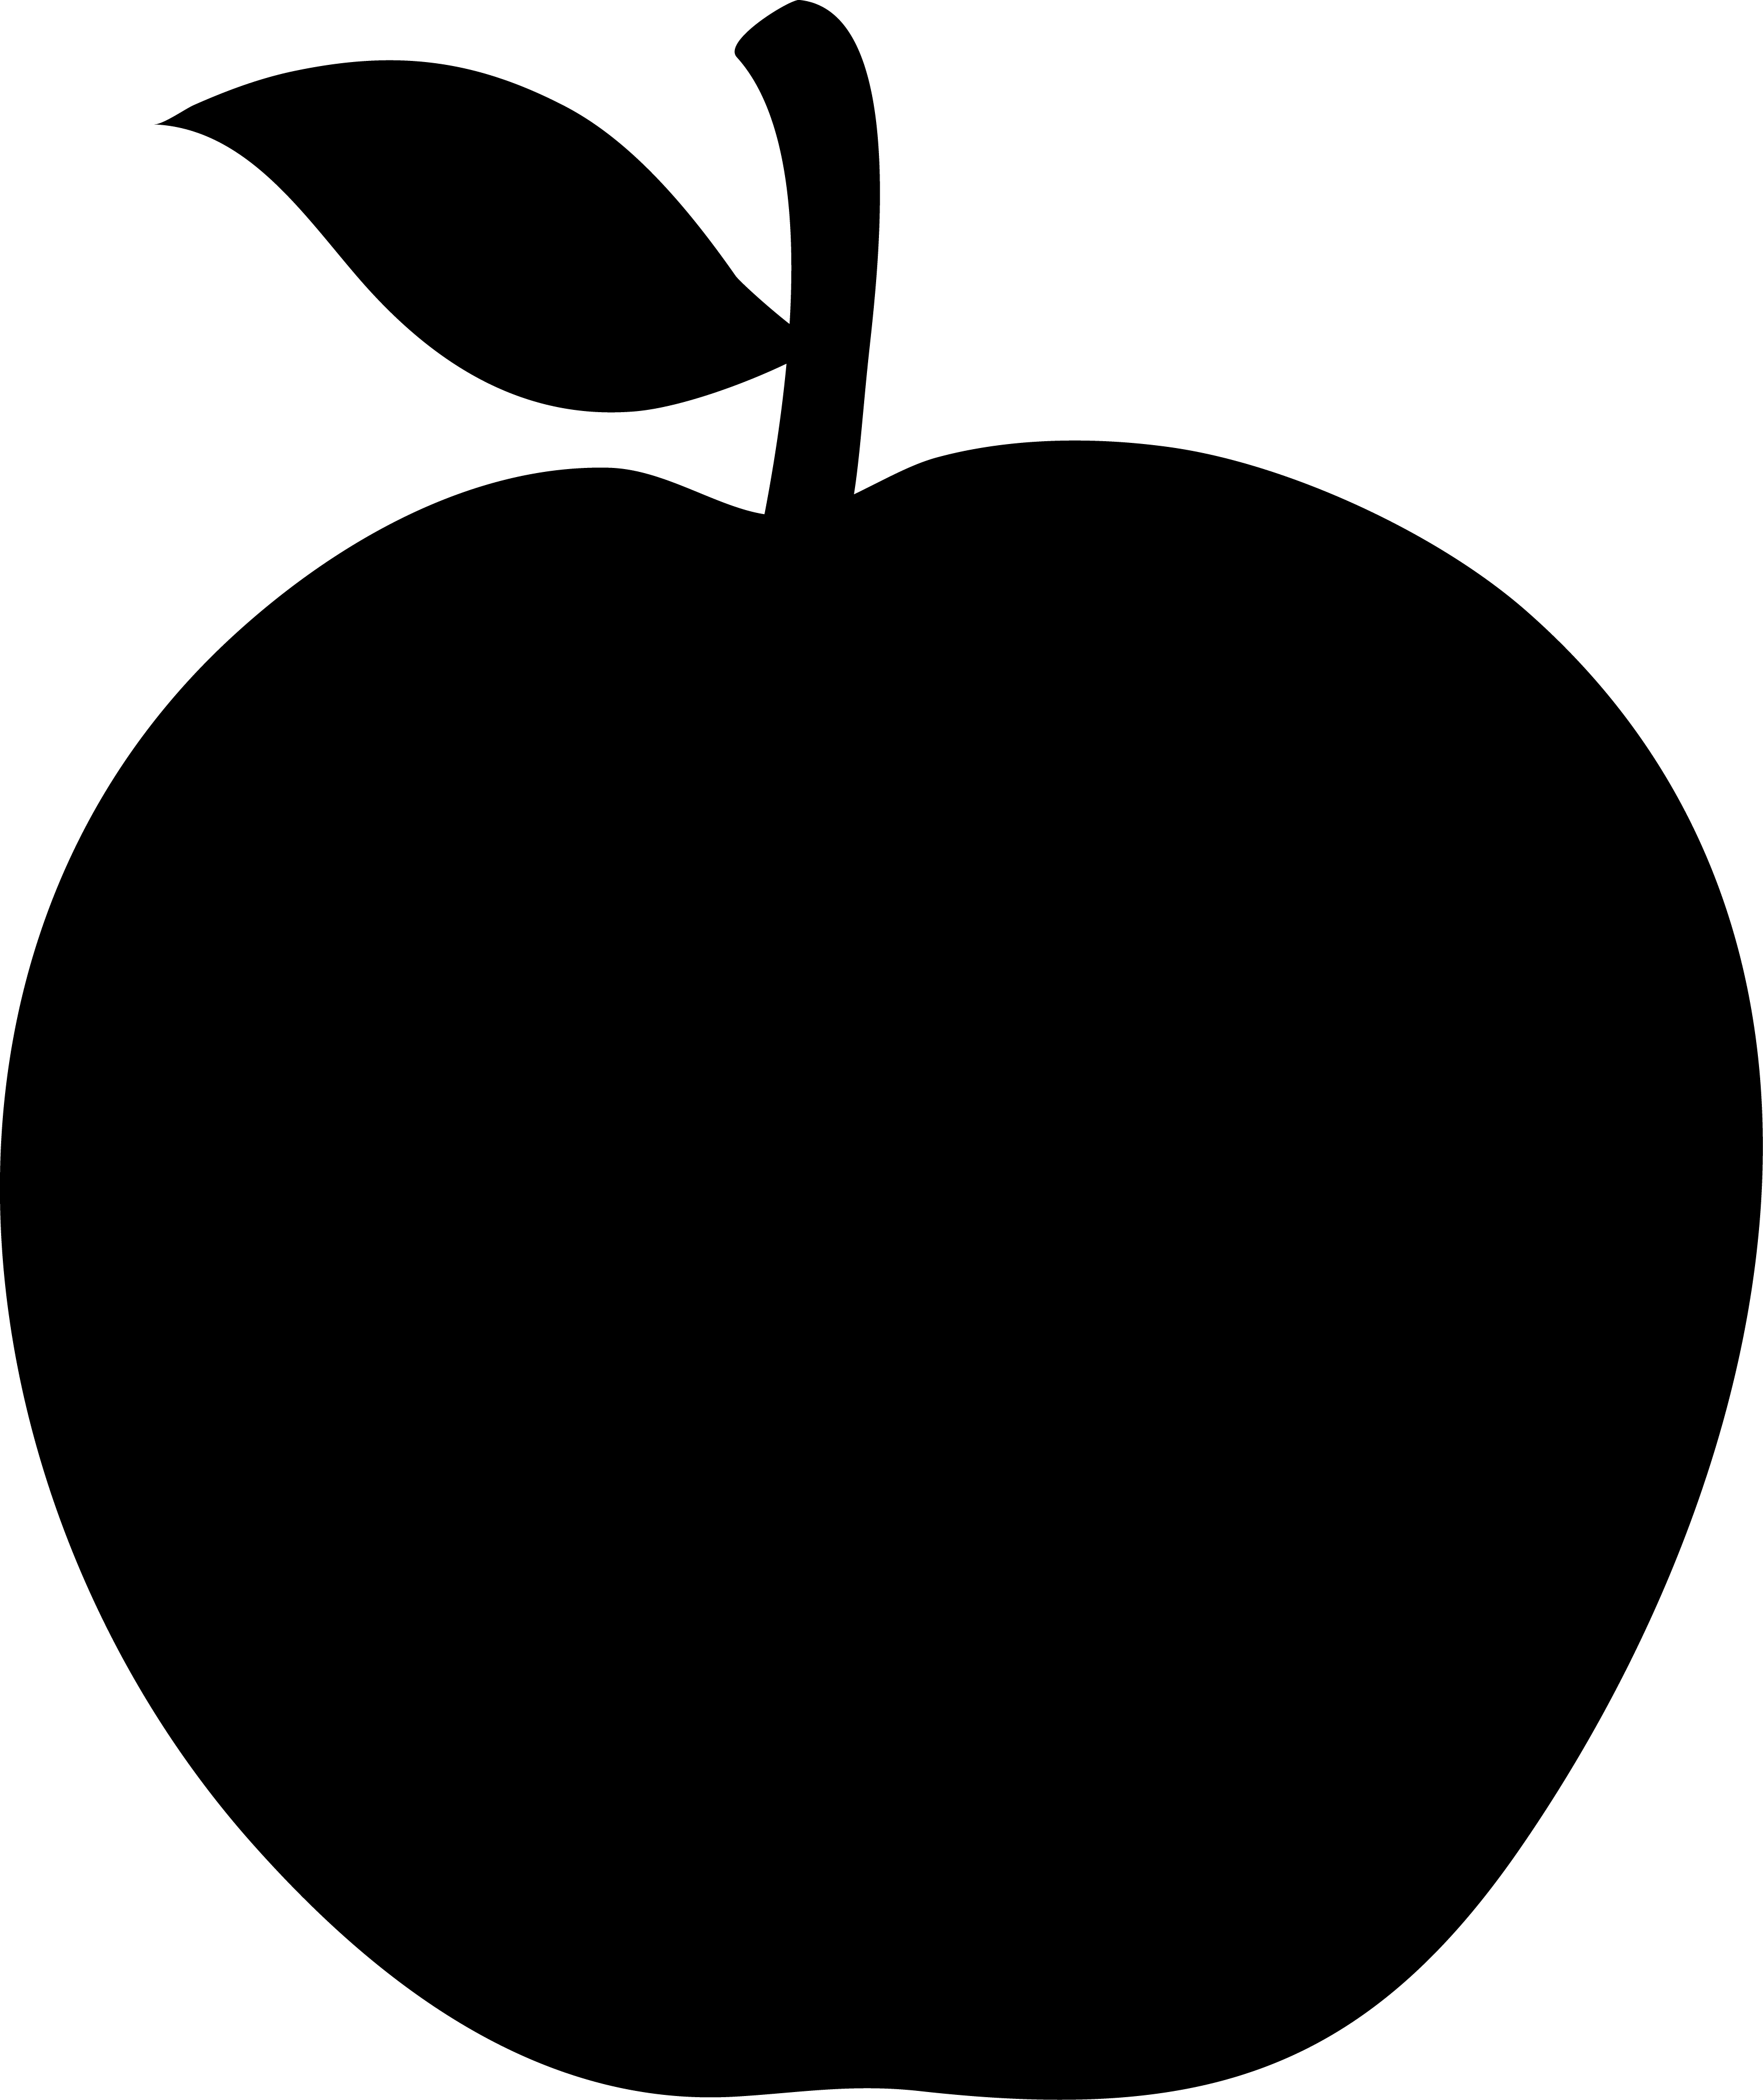 3097x3689 Black Apple Silhouette Vector